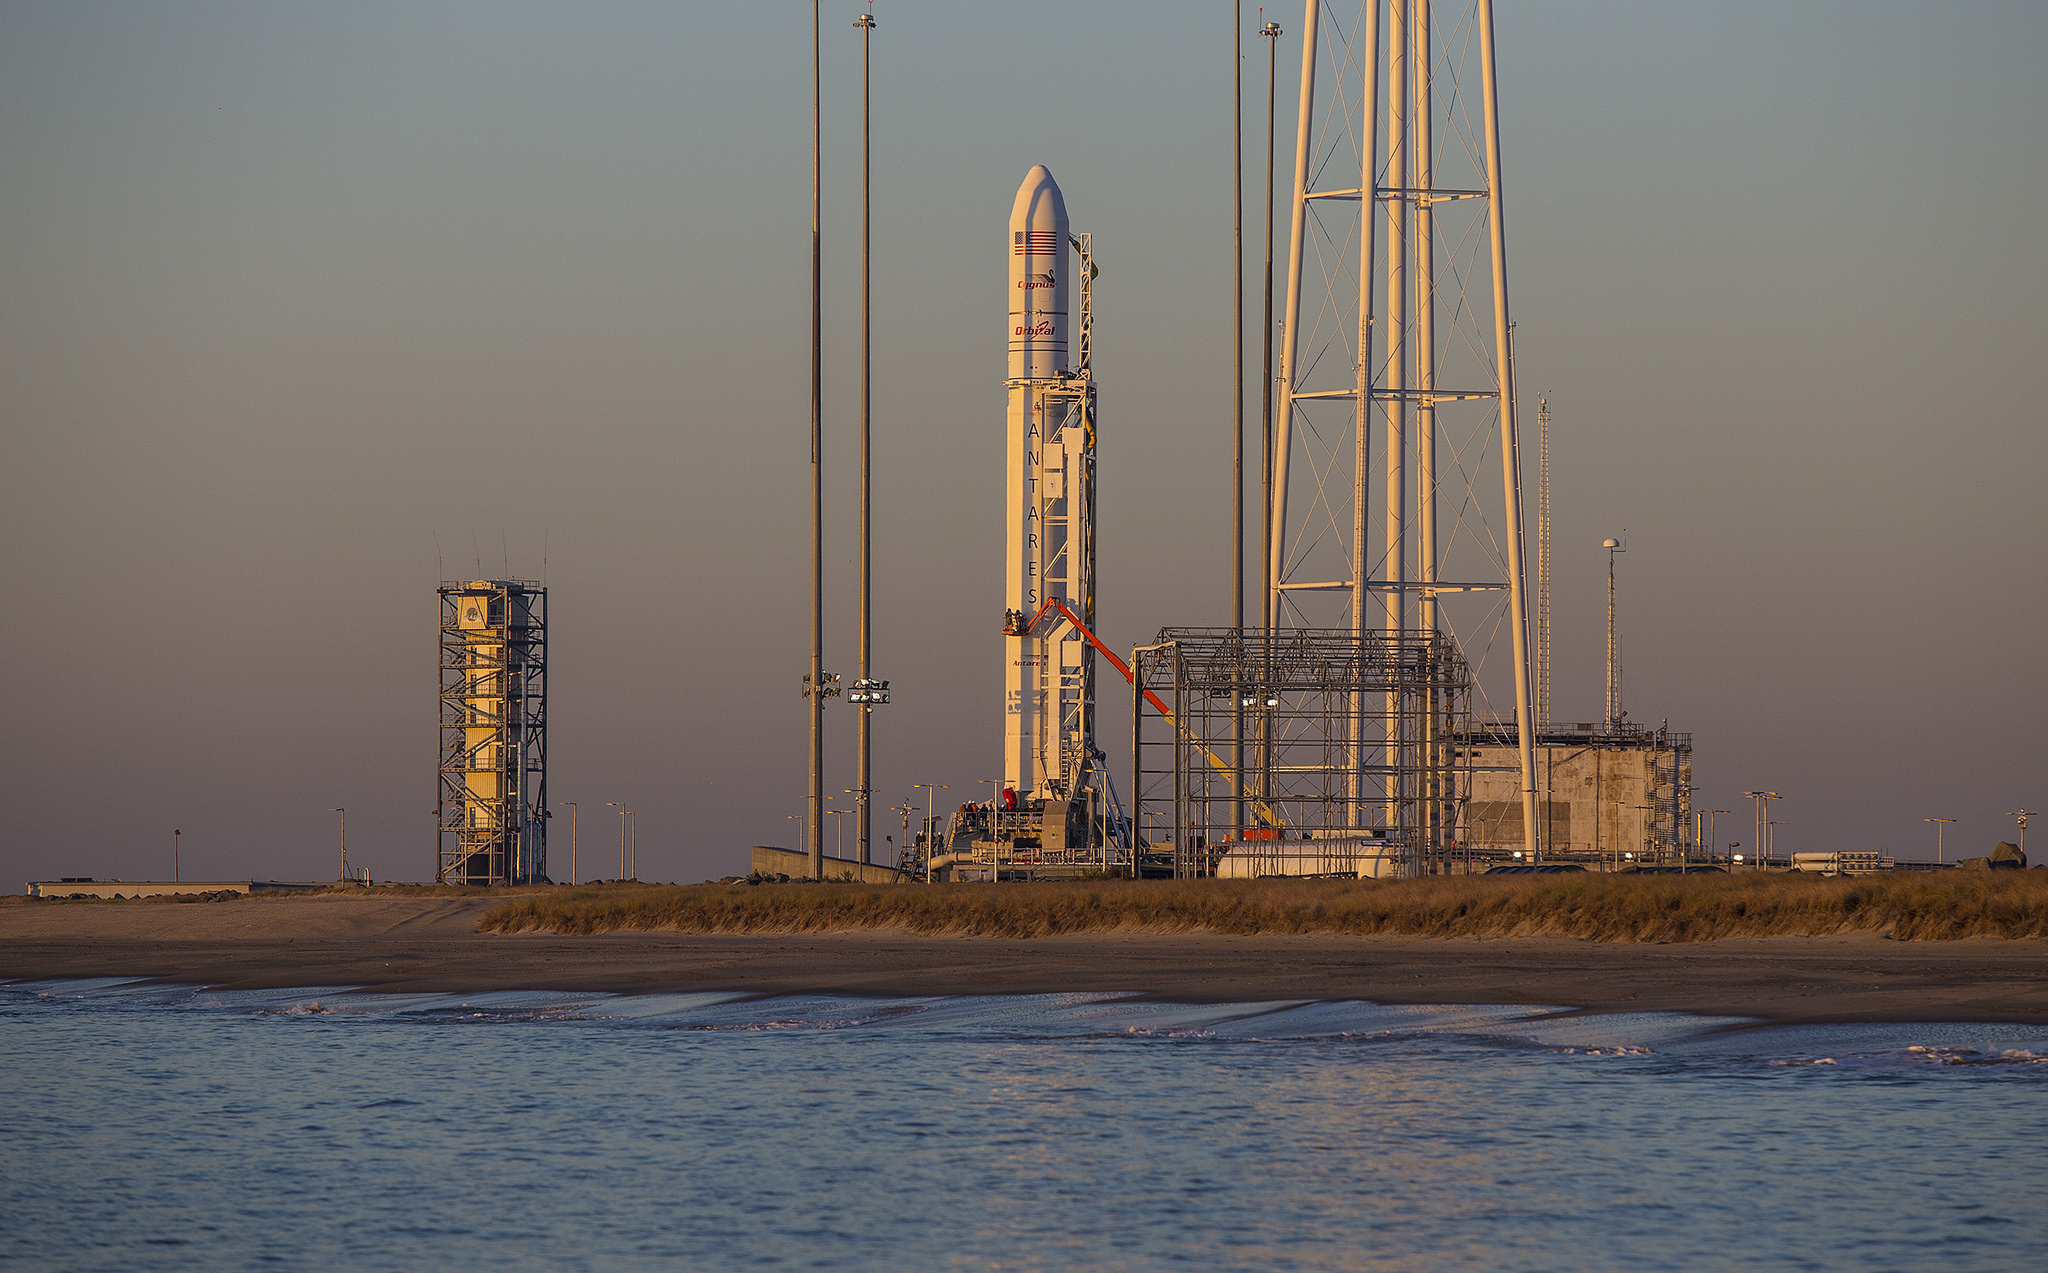 The Antares rocket on launch pad 0A at Wallops Island, Va. Credit: Orbital Sciences Corp.